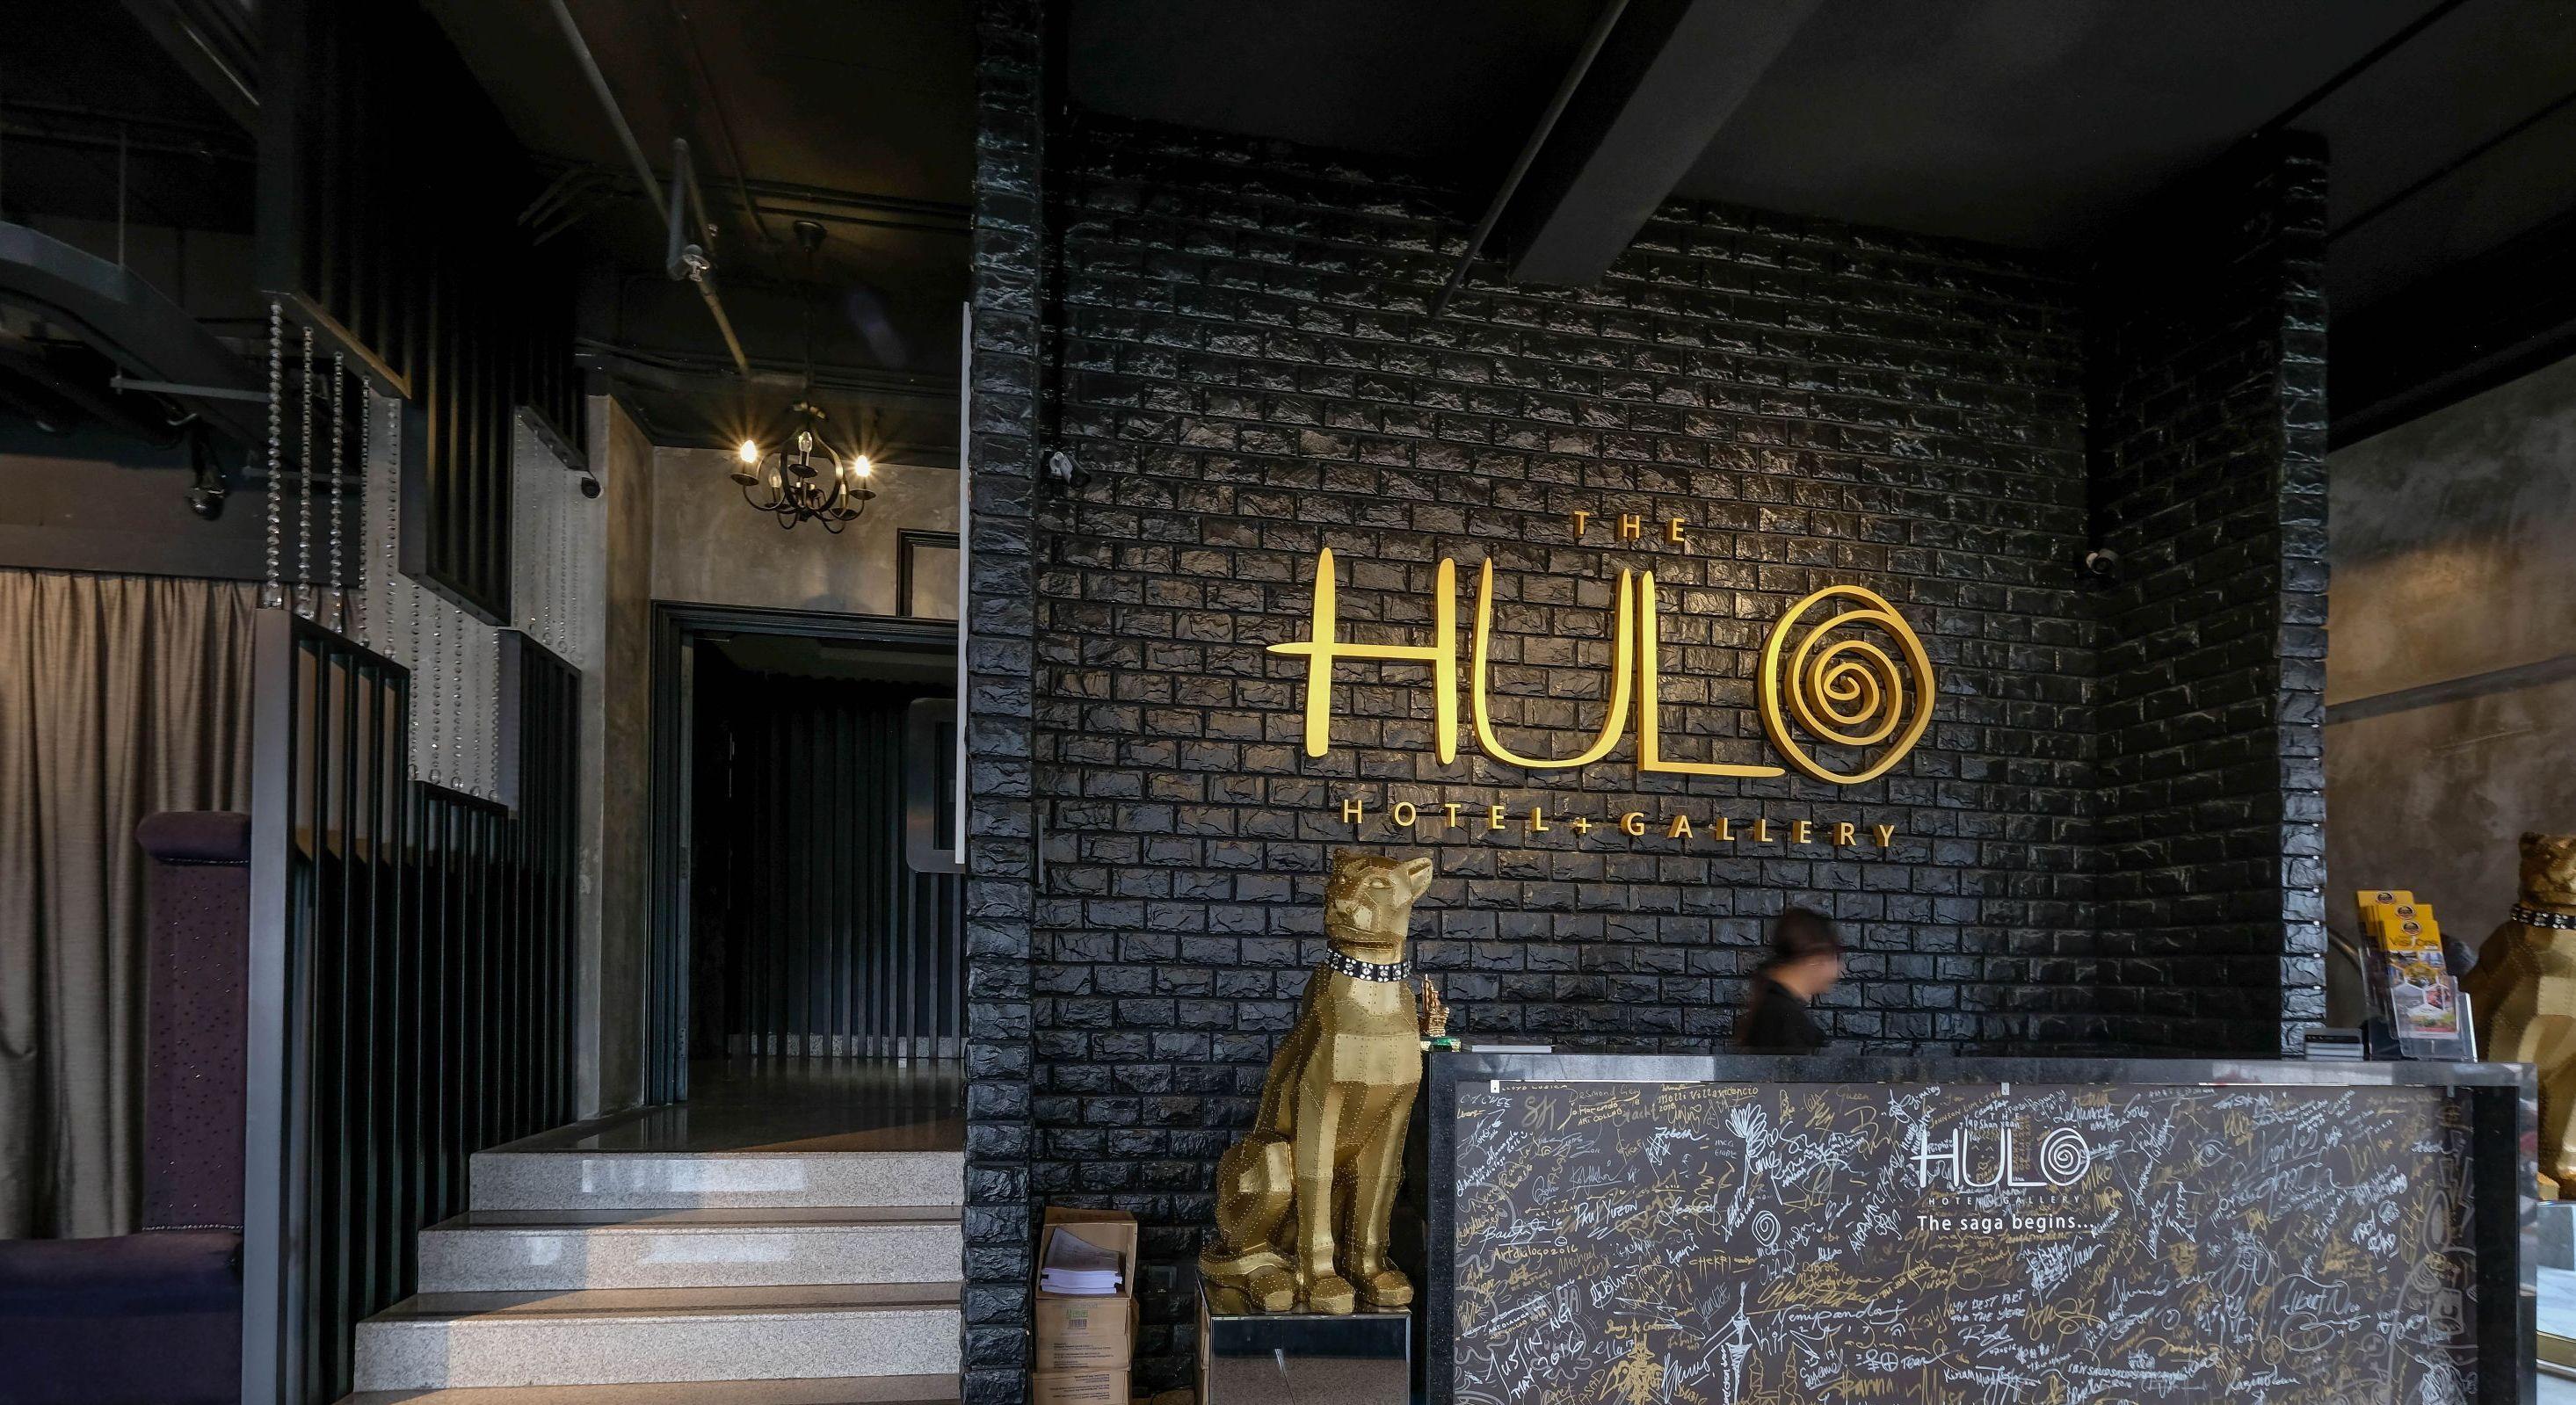 The Hulo